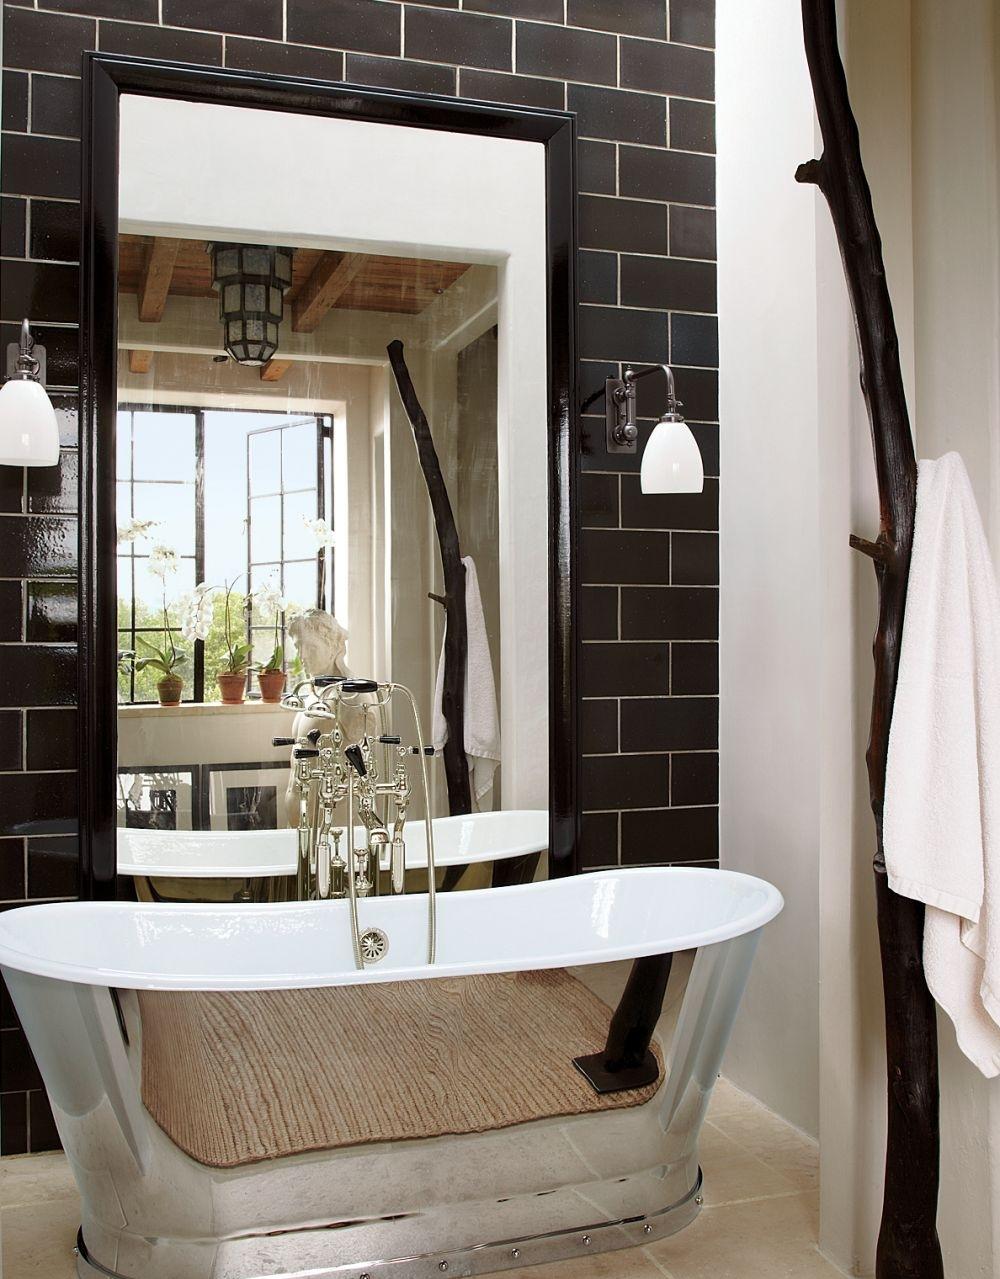 Photo 7 - Salle de bain high-tech noir et blanc